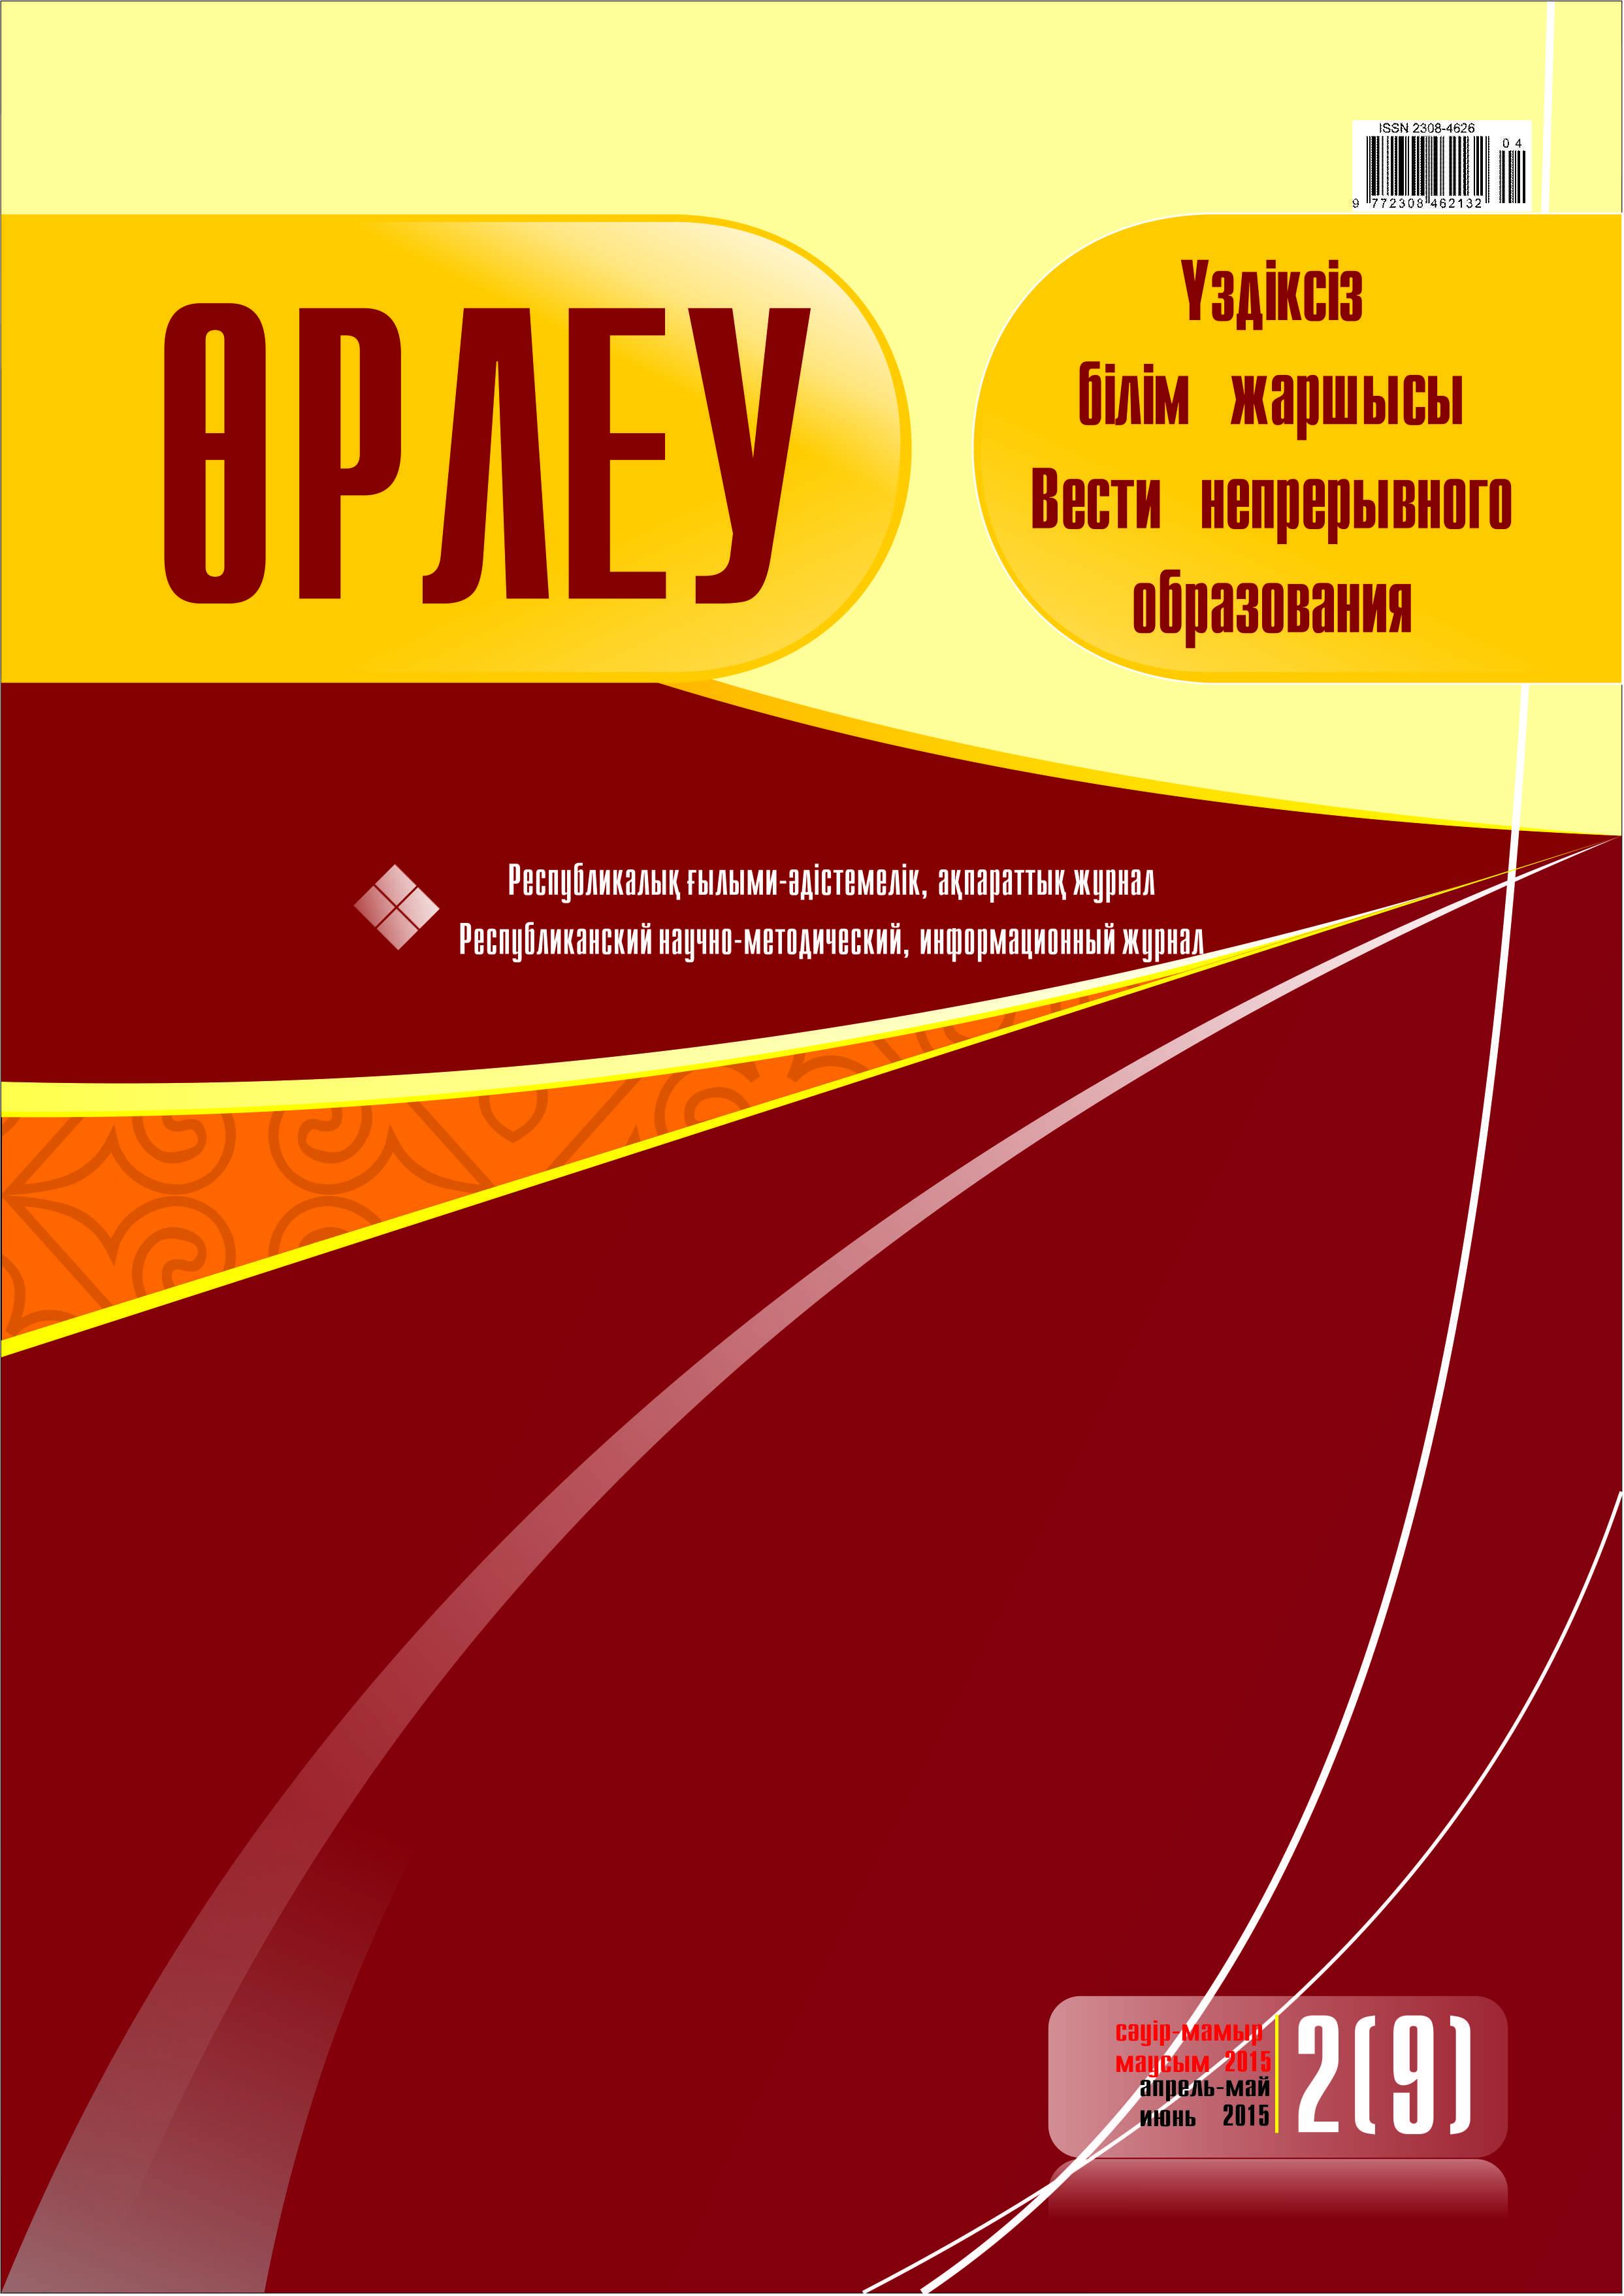 C:\Users\Zhailybaeva_A\Desktop\обложки для Жулдыз\обложка журнала Орлеу 2,9.jpg